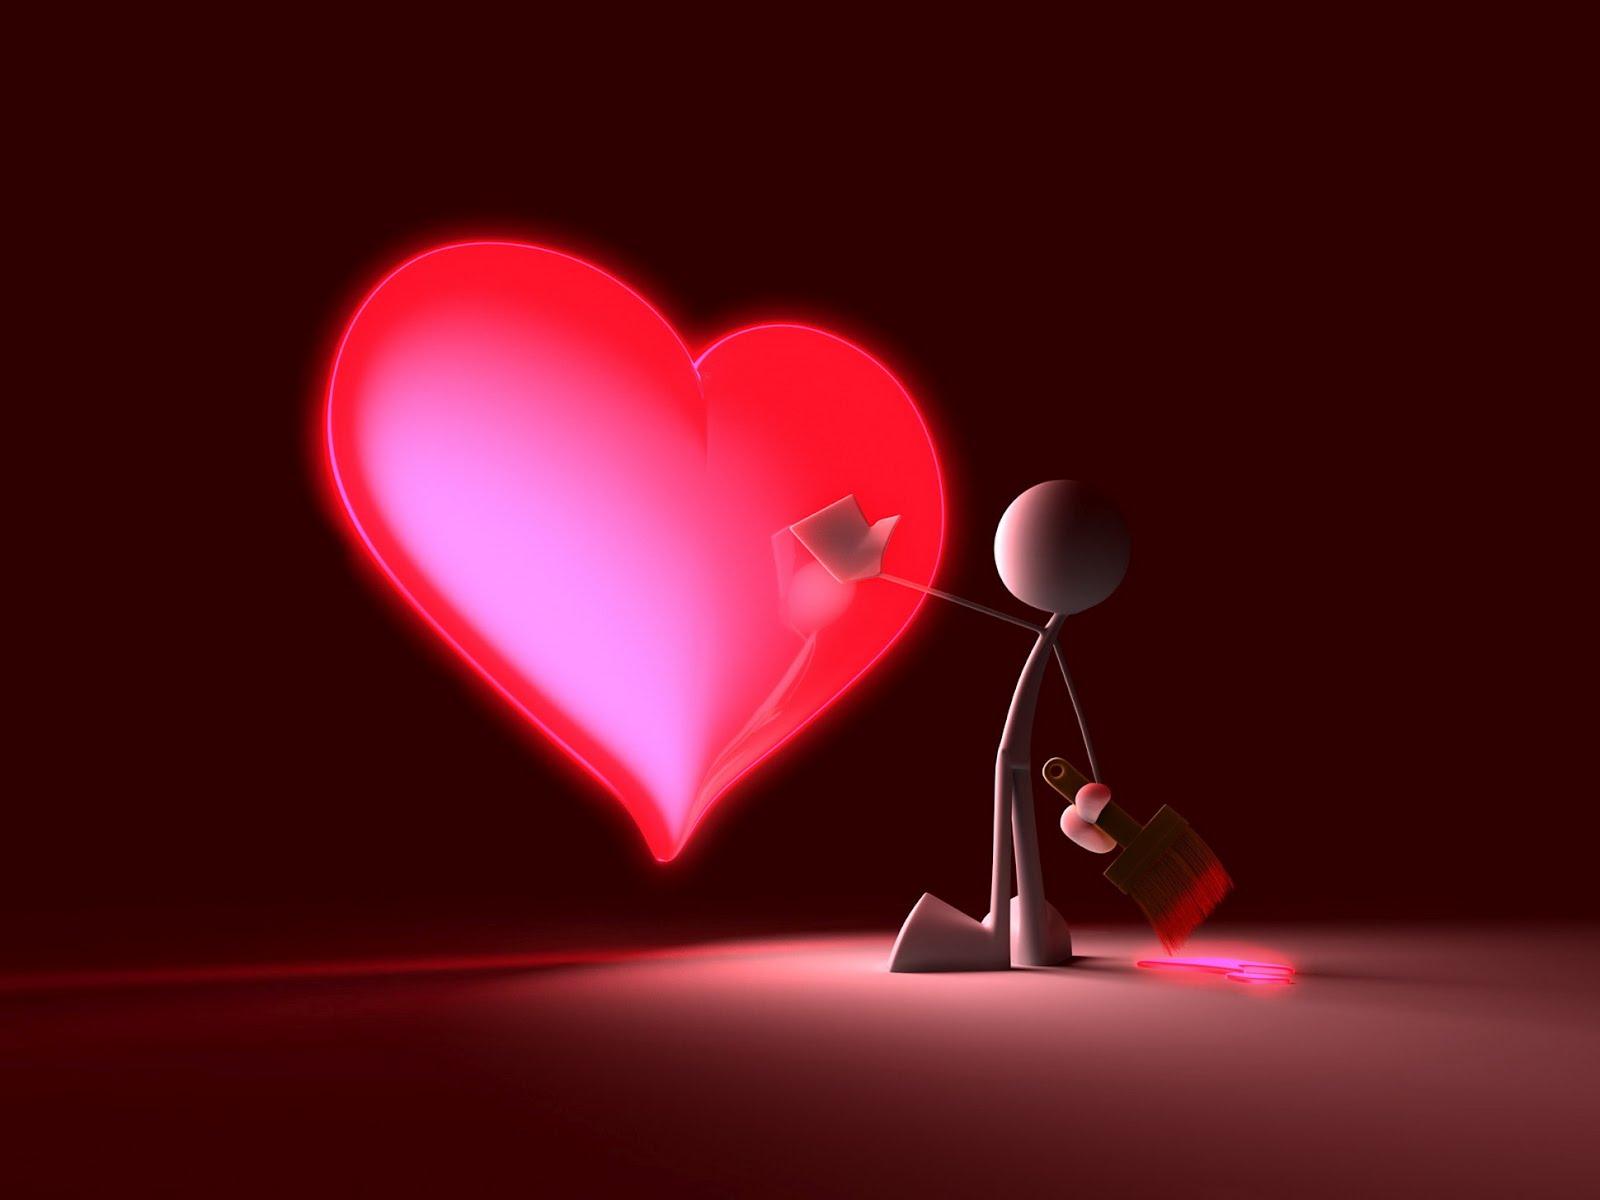 Fileab95c Pintando Un Corazon De Amor 14 De Febrero Dia De San